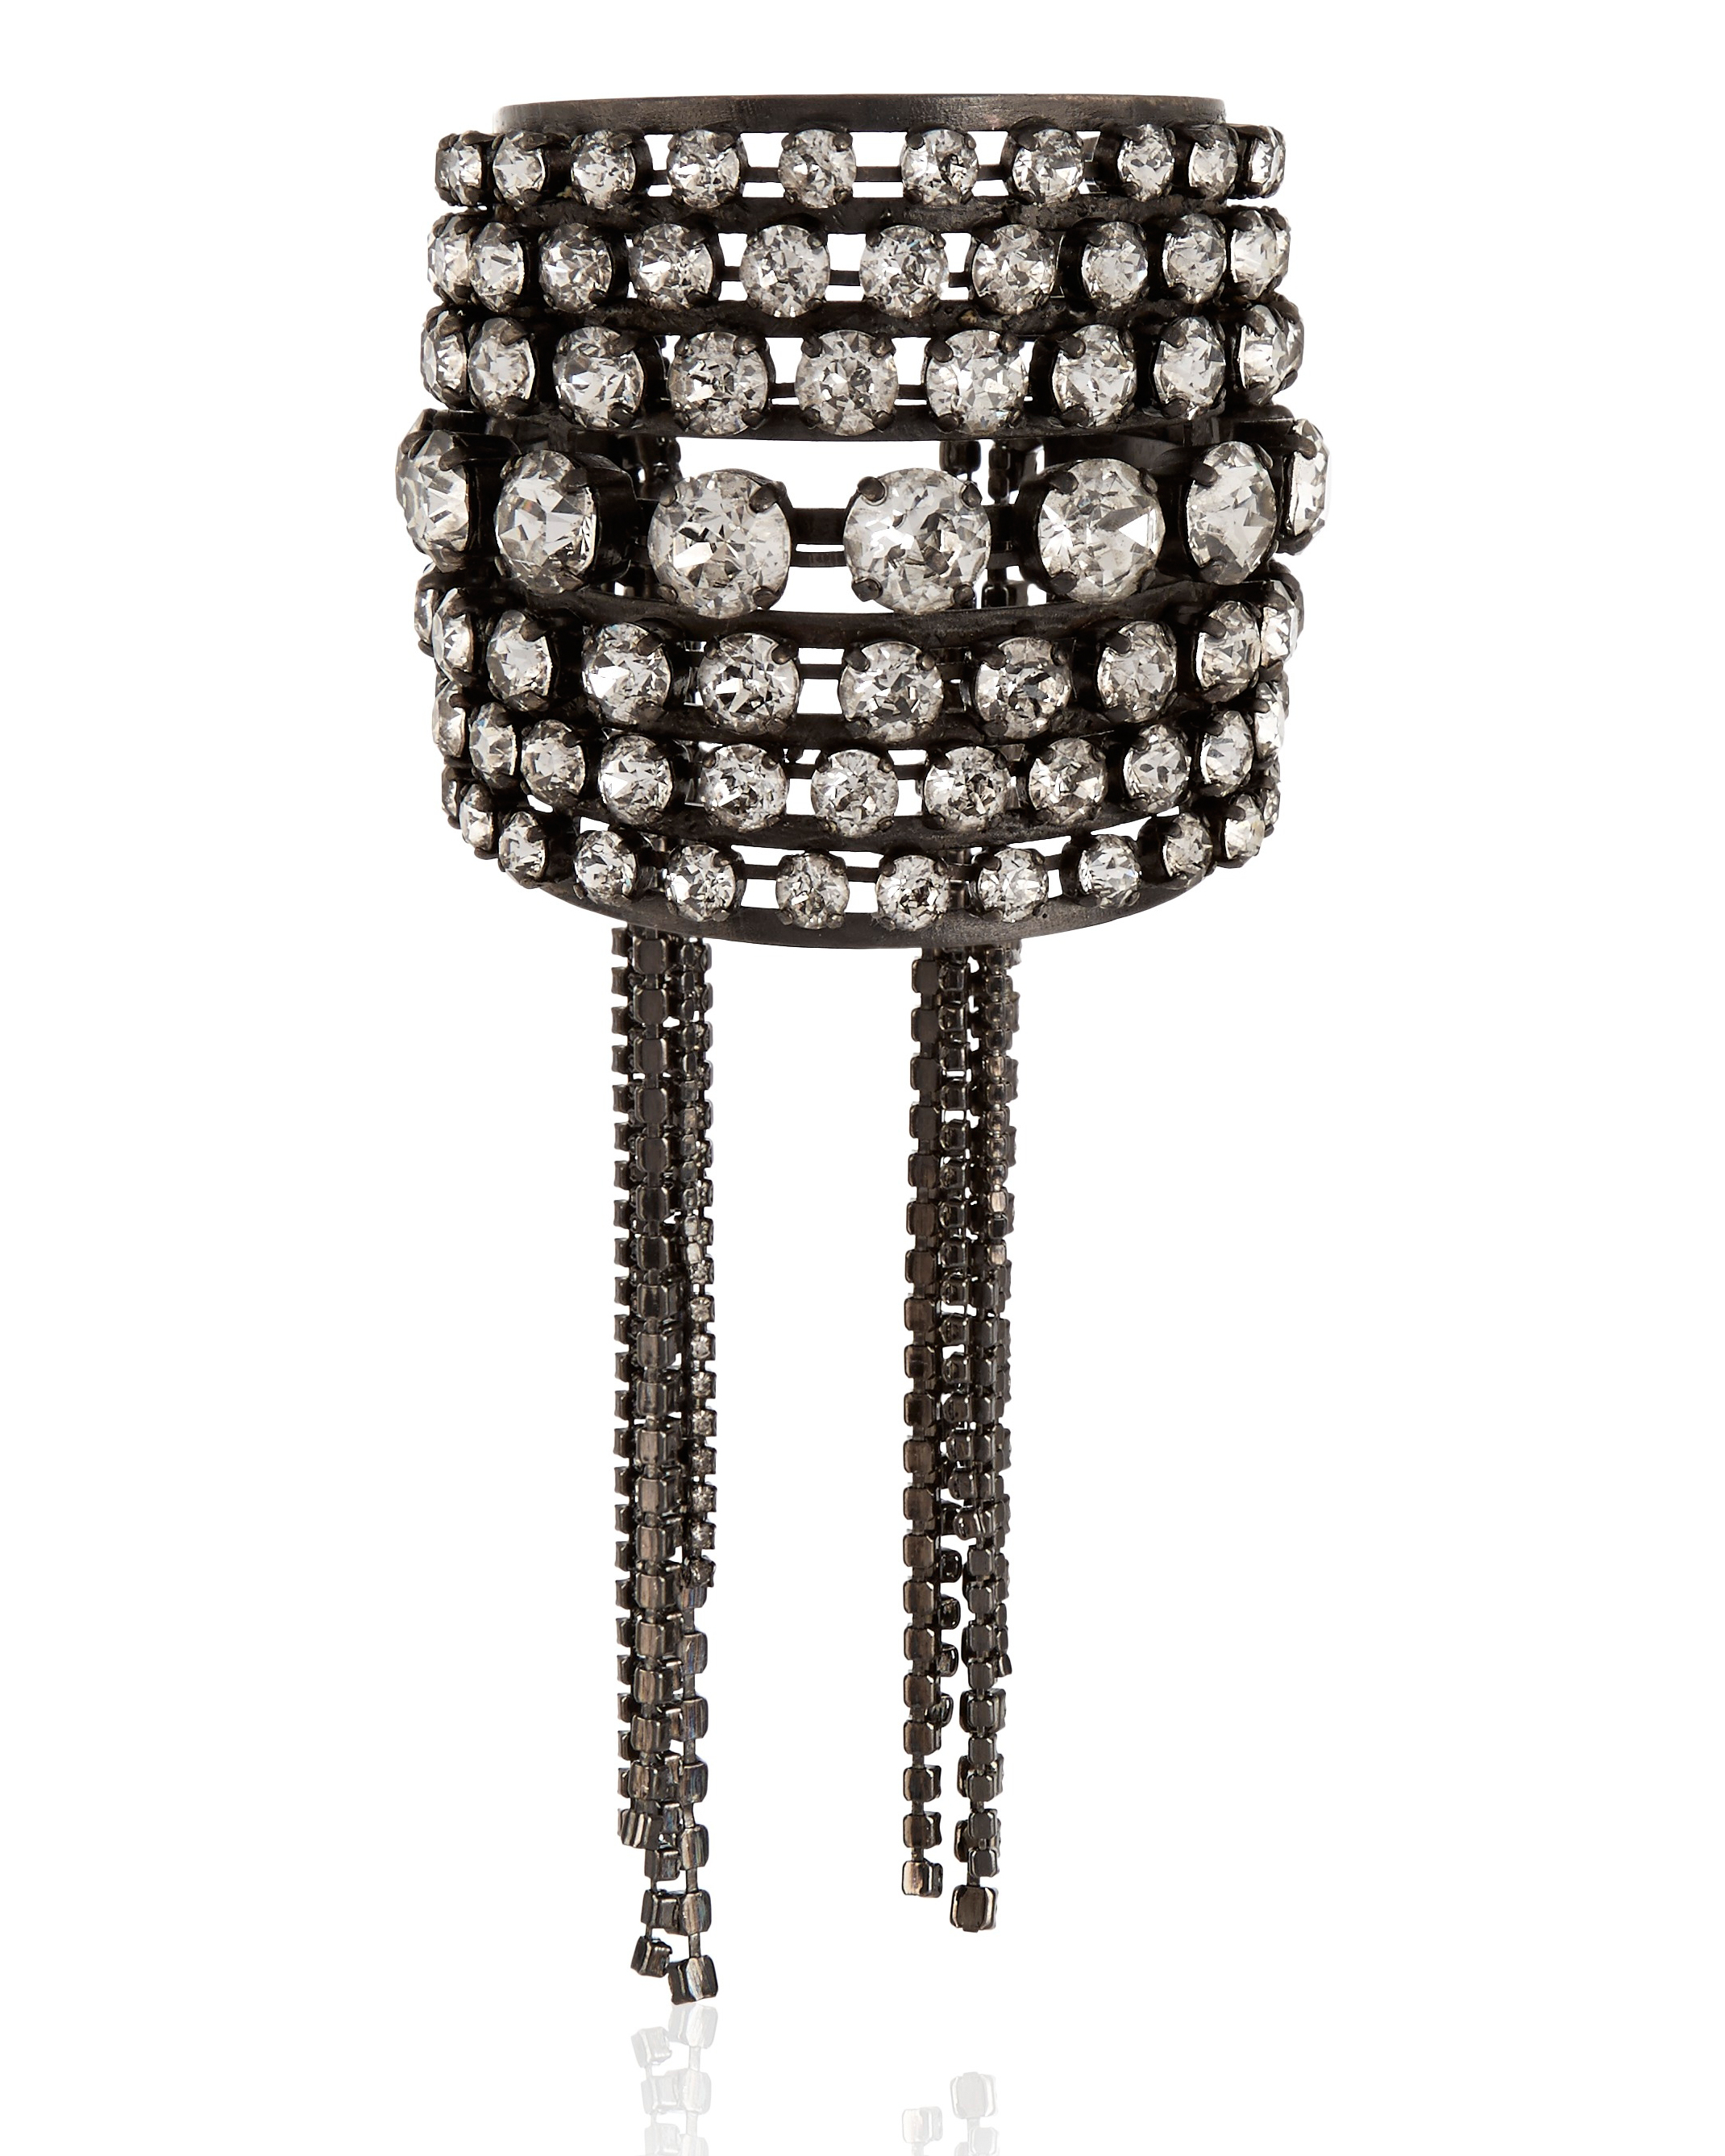 sparkly-accessories-erickson-beamon-nap-1215.jpg